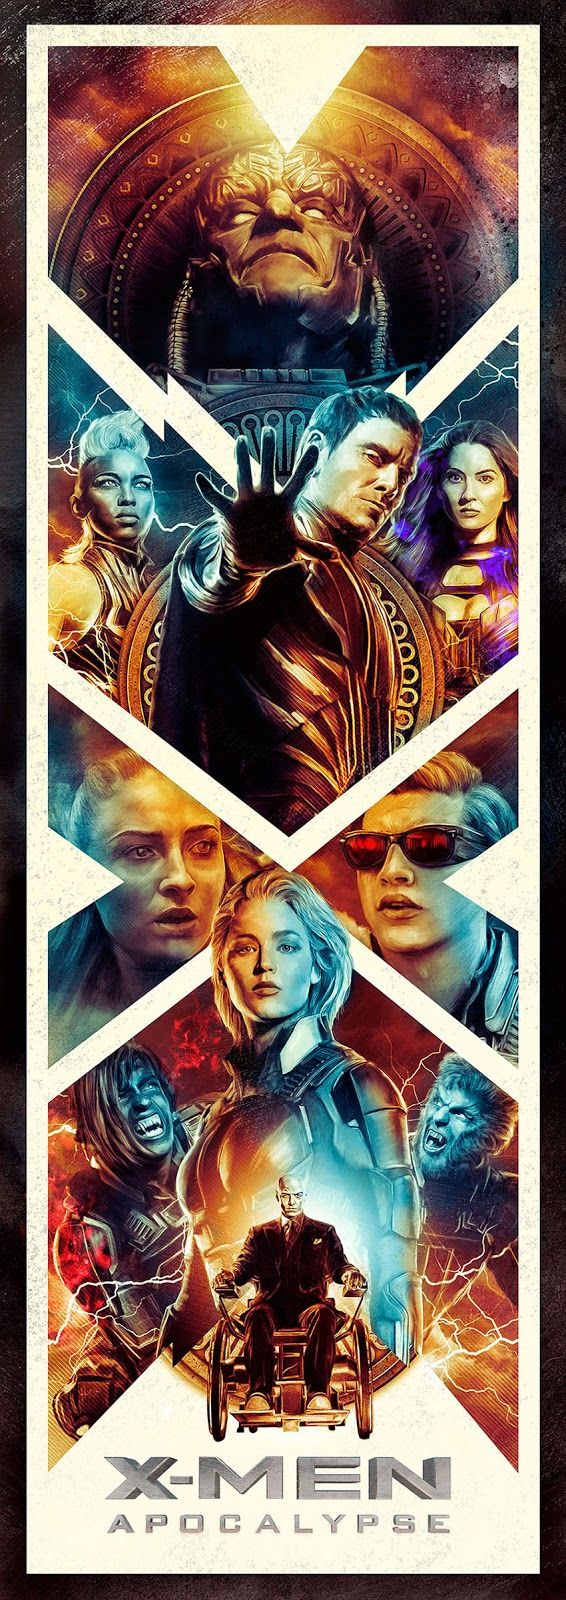 X-Men Apocalypse - Rich Davies